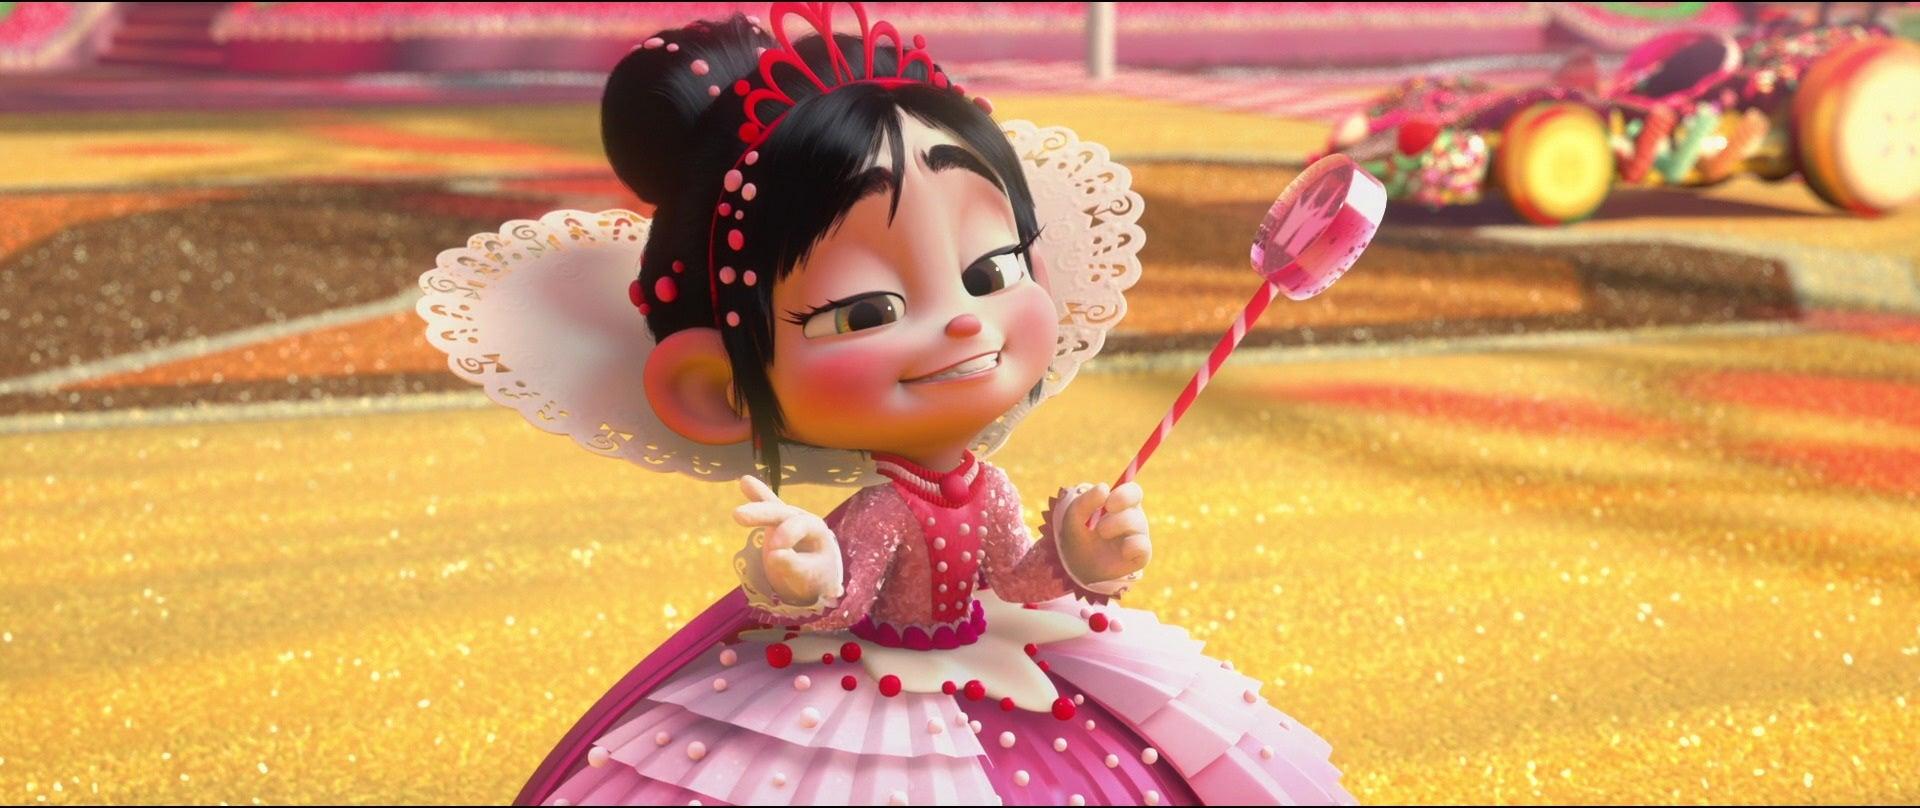 Disney Princess Names Popular New Baby Names...